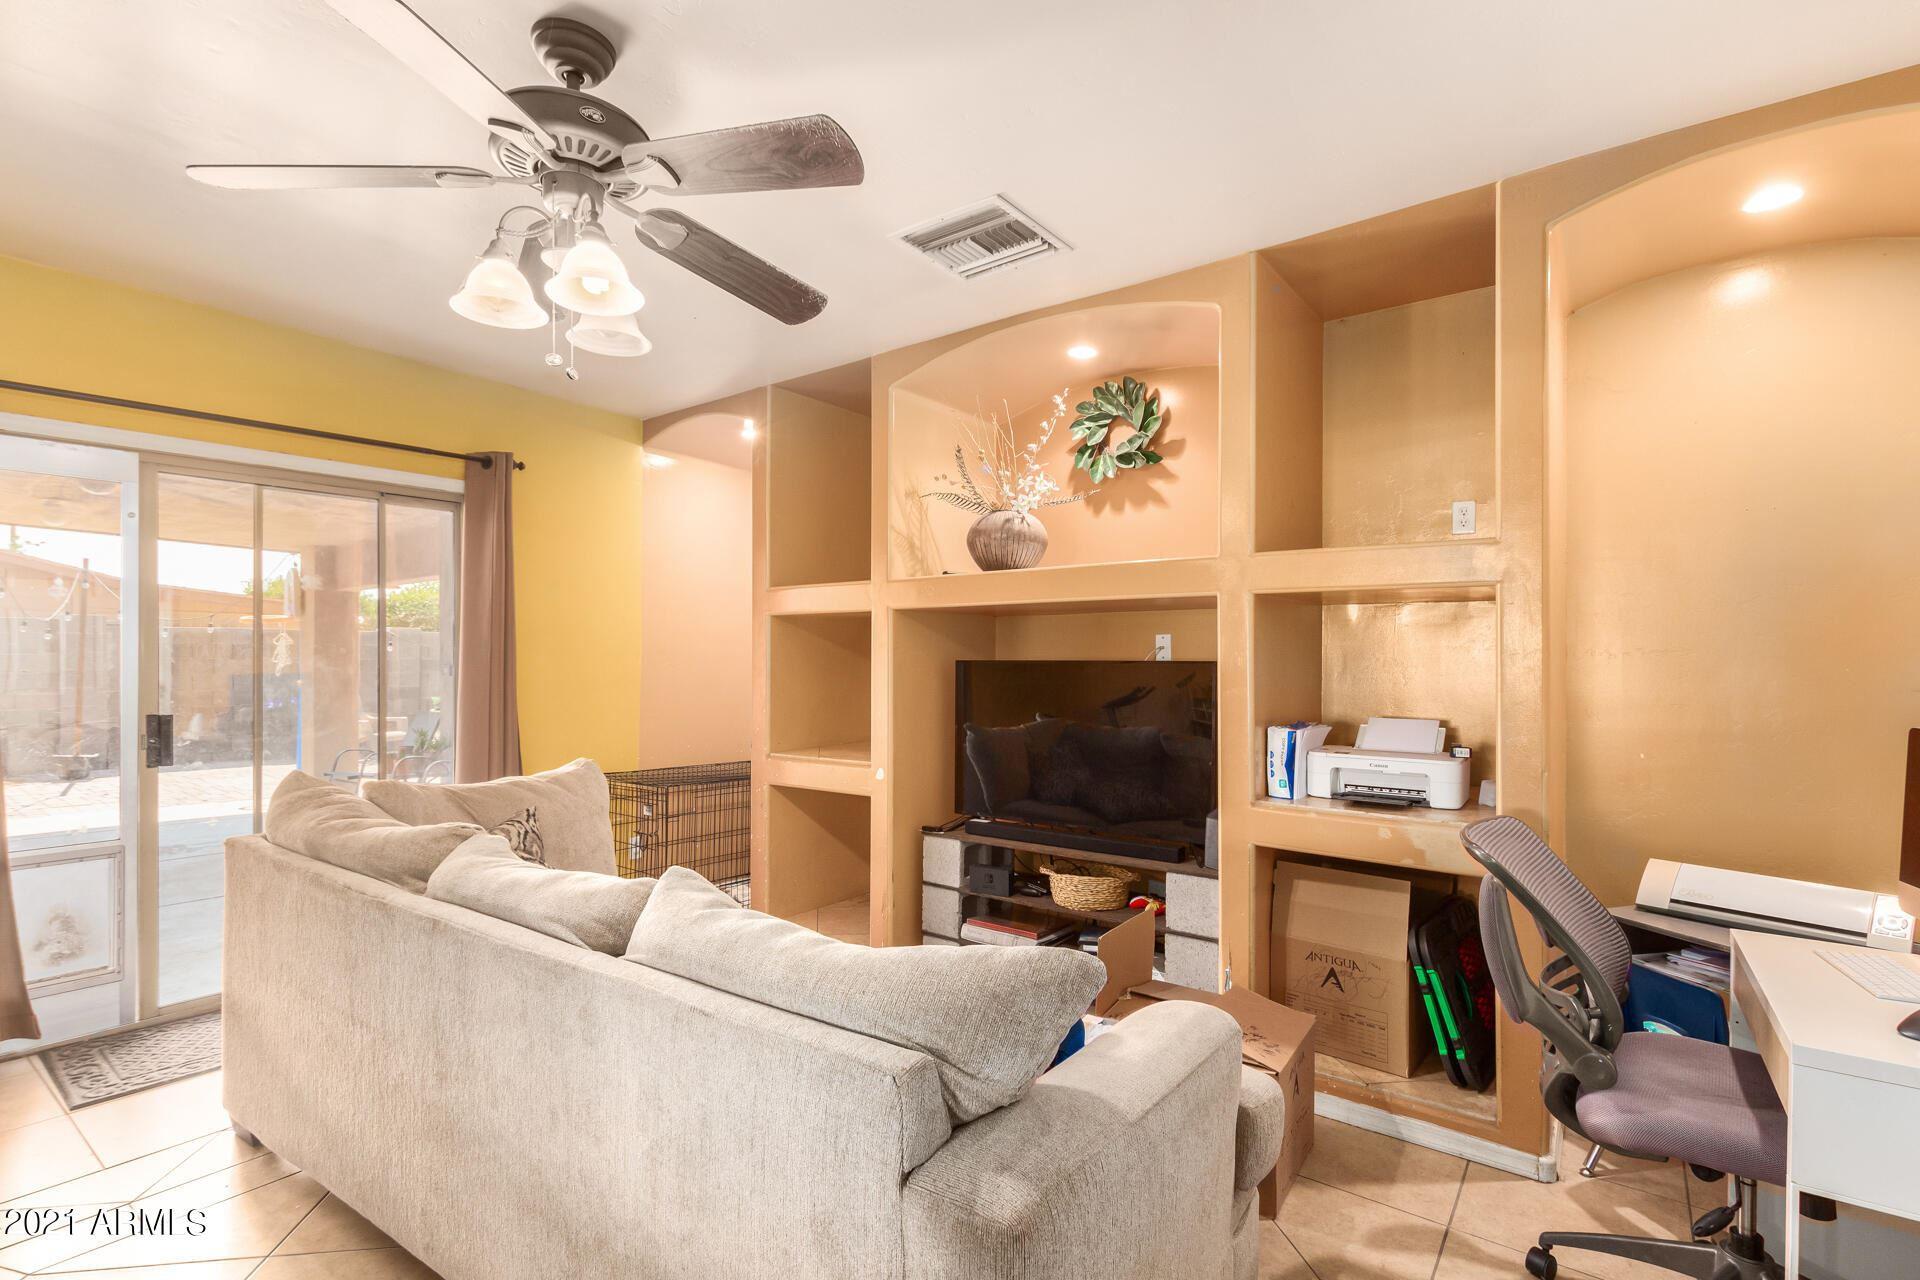 Photo of 14110 N 4TH Avenue, El Mirage, AZ 85335 (MLS # 6292382)